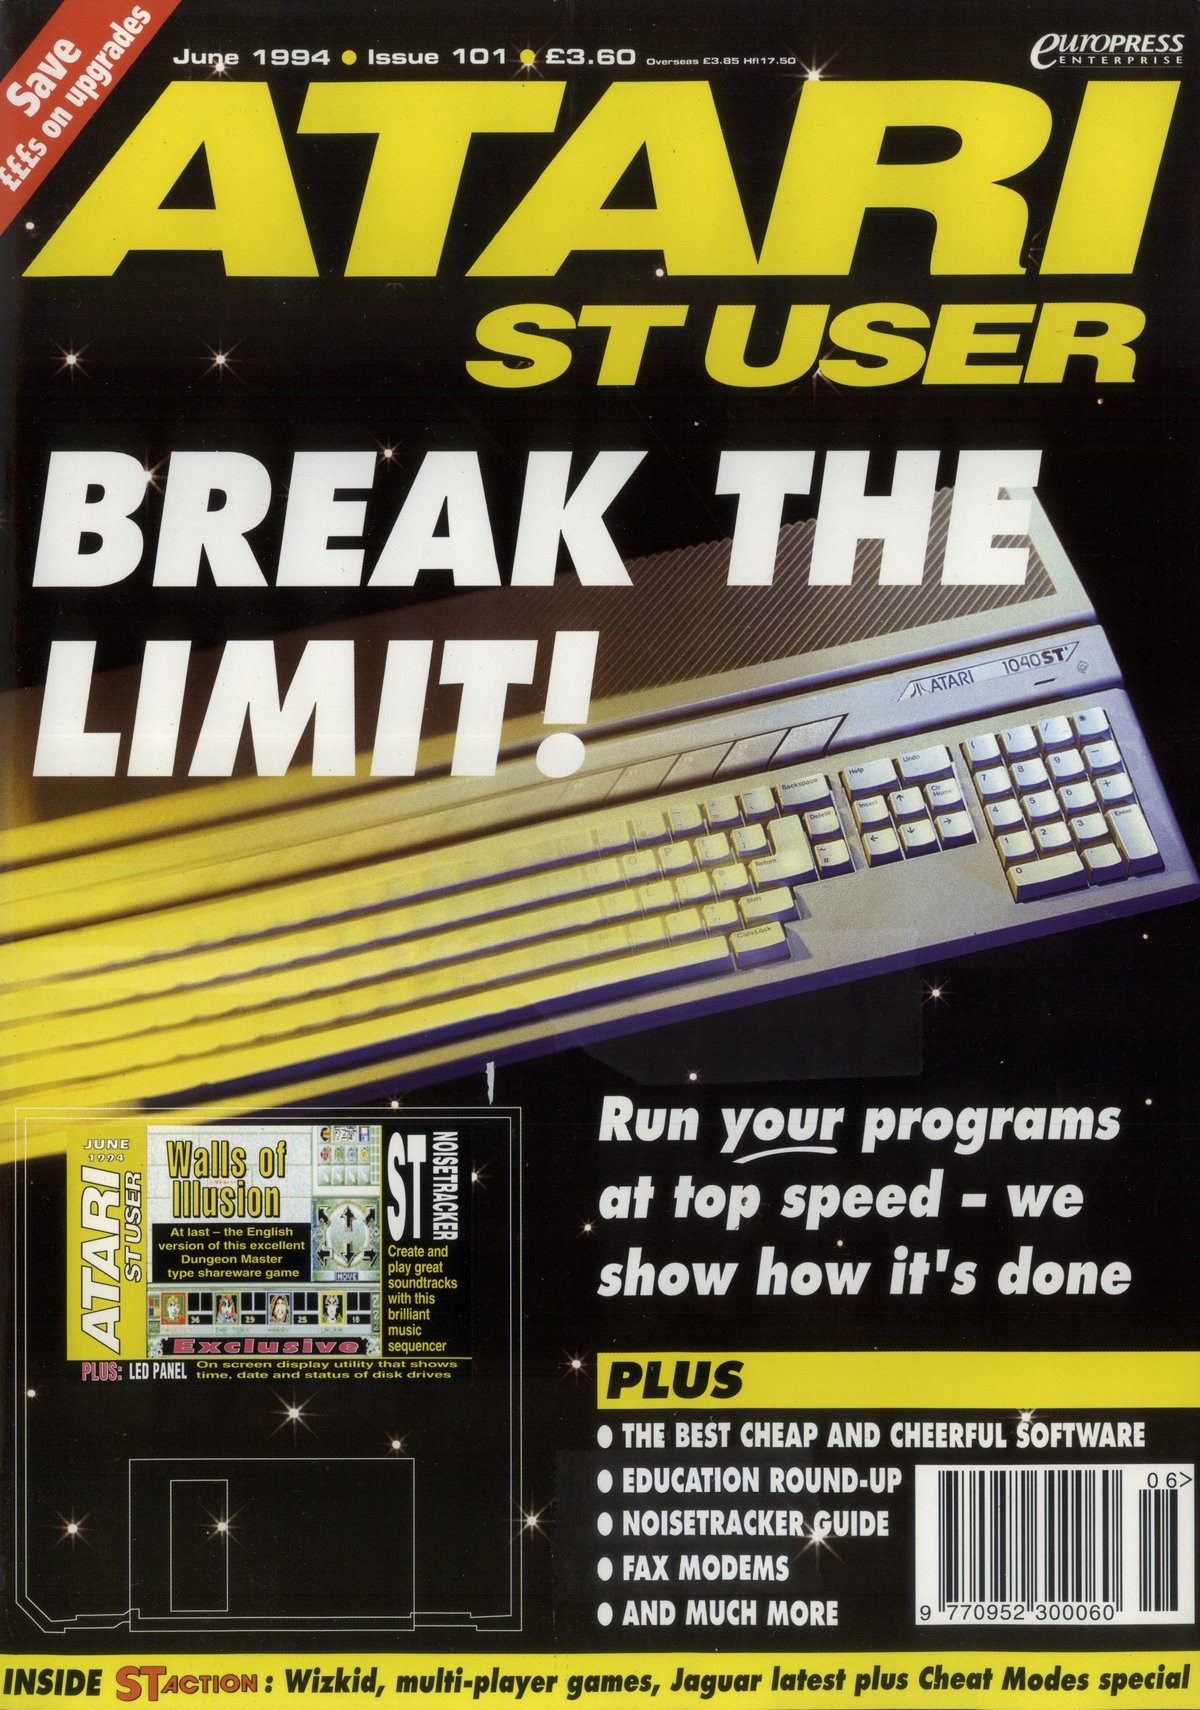 Atari ST User Issue 101 (June 1994)